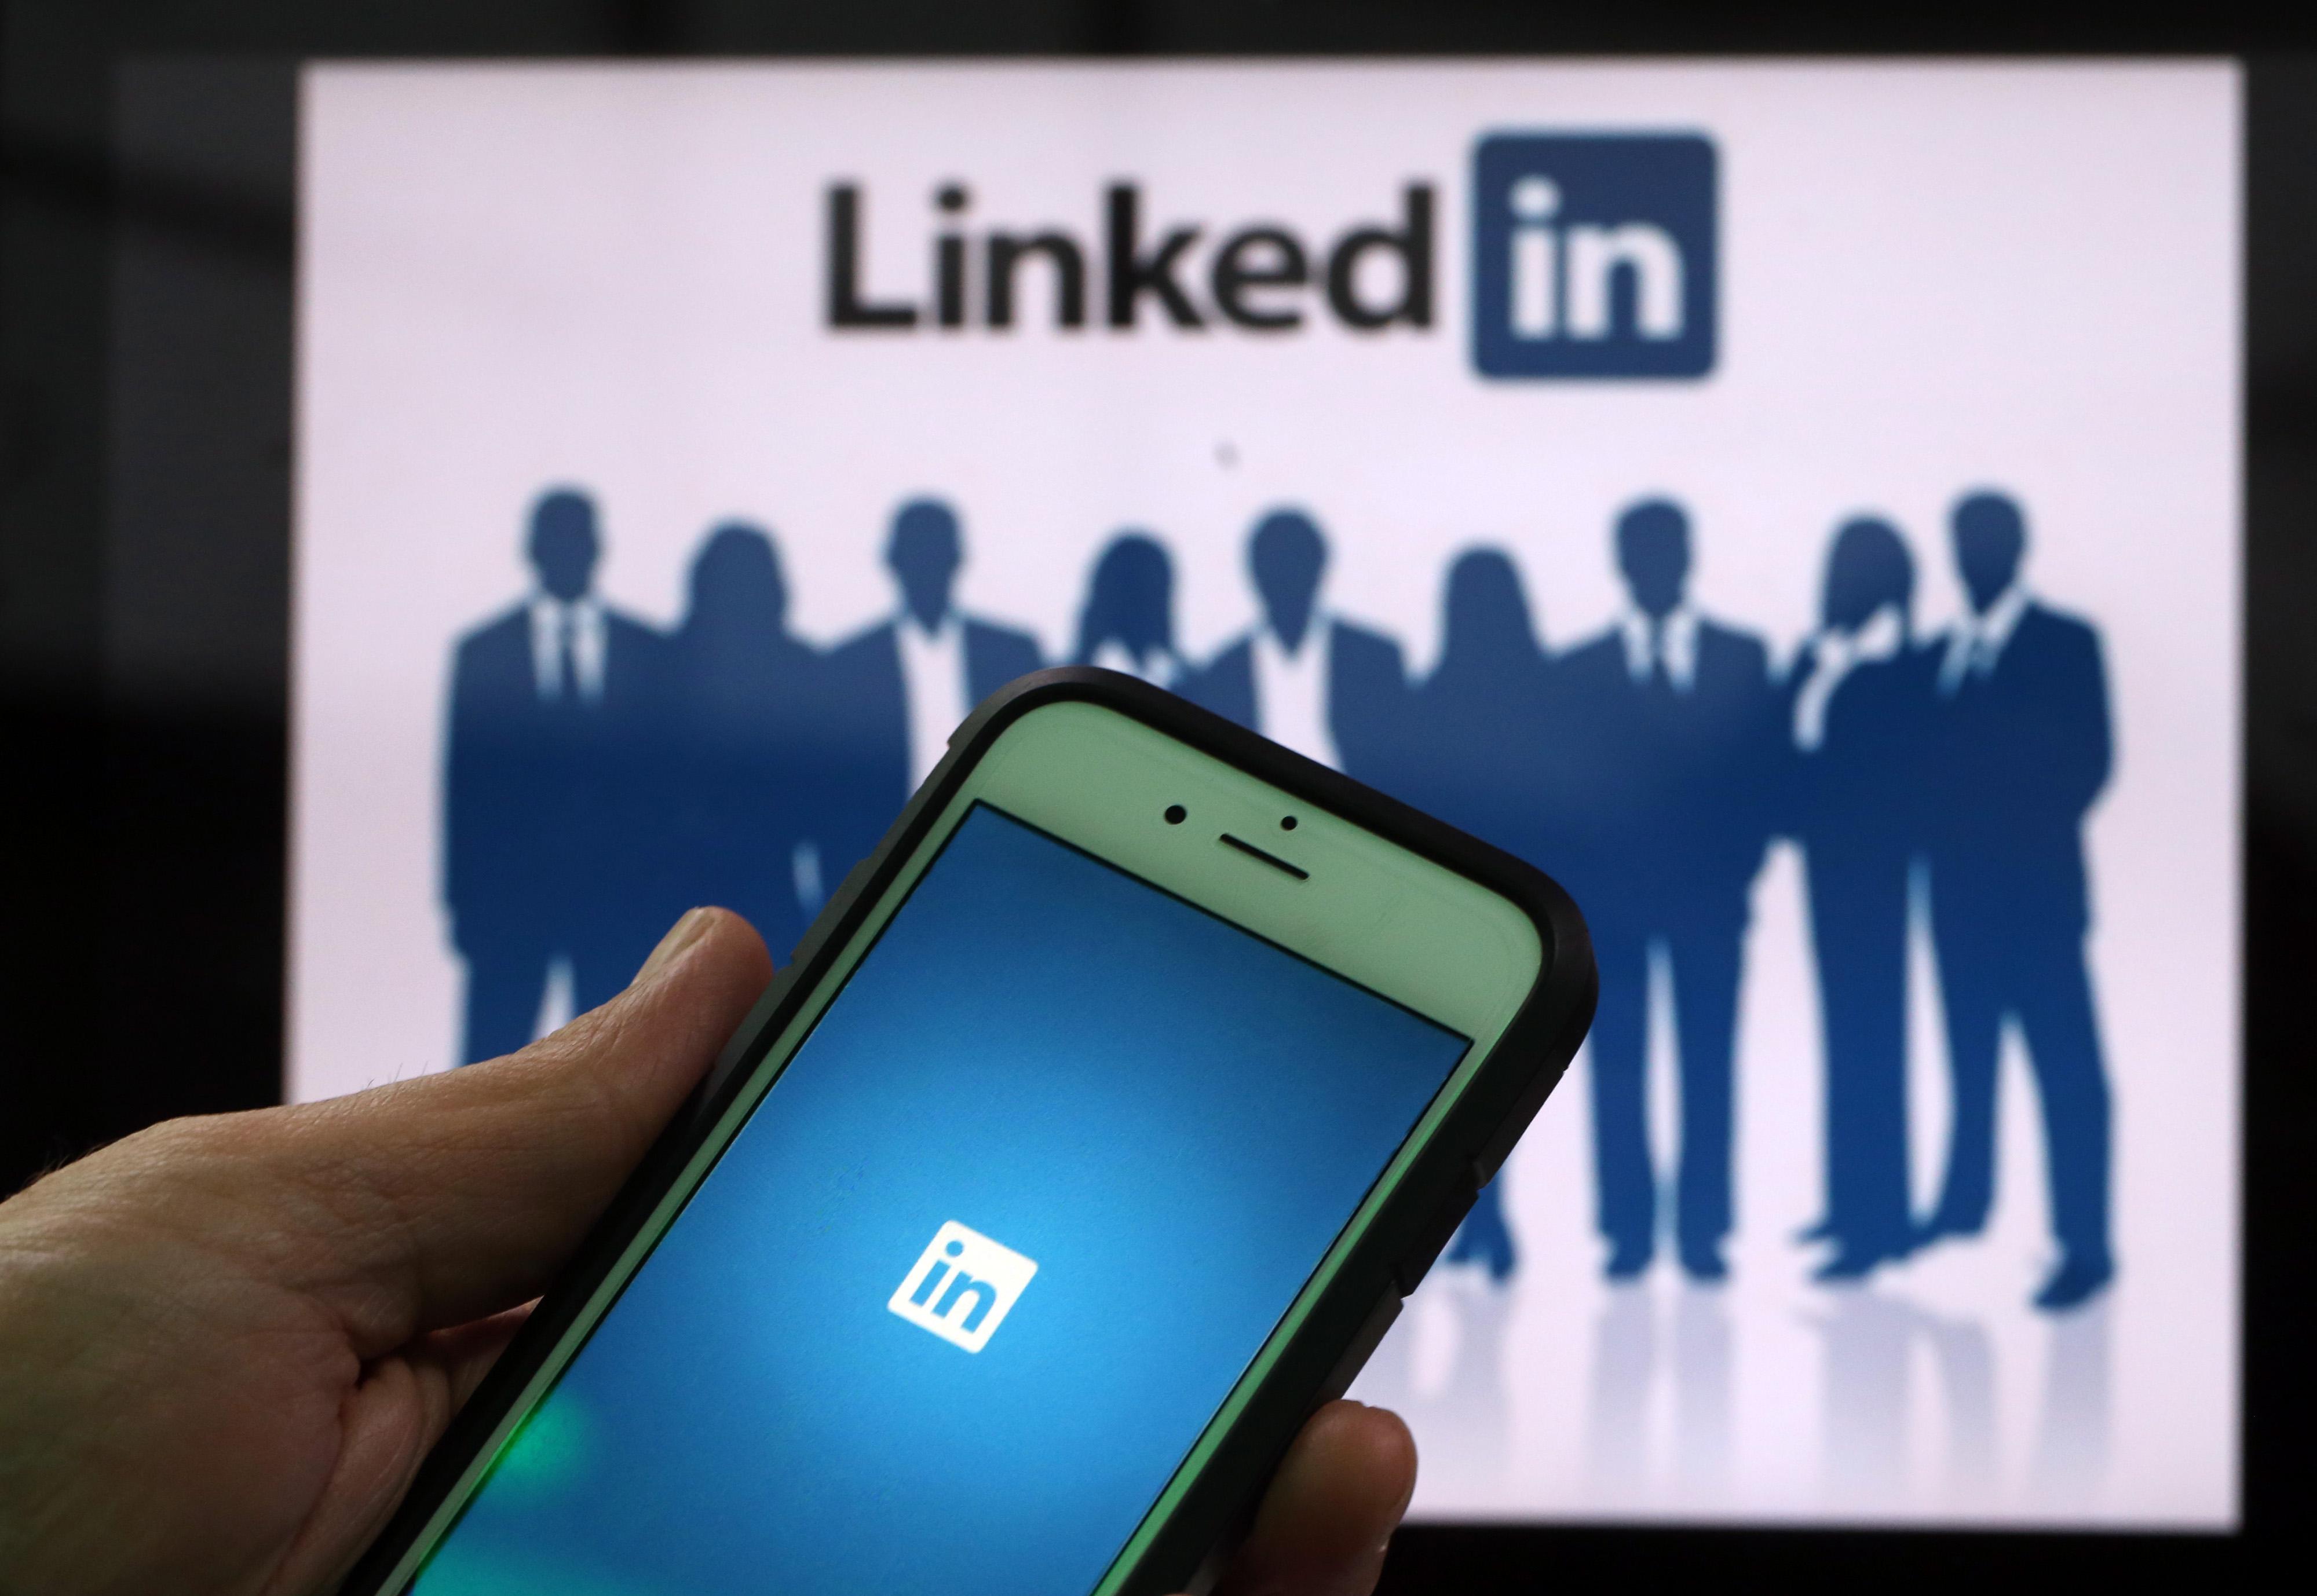 linkedinSocialMediaBloombergjpg httpswwwemployeebenefitadvisercomnewson small business